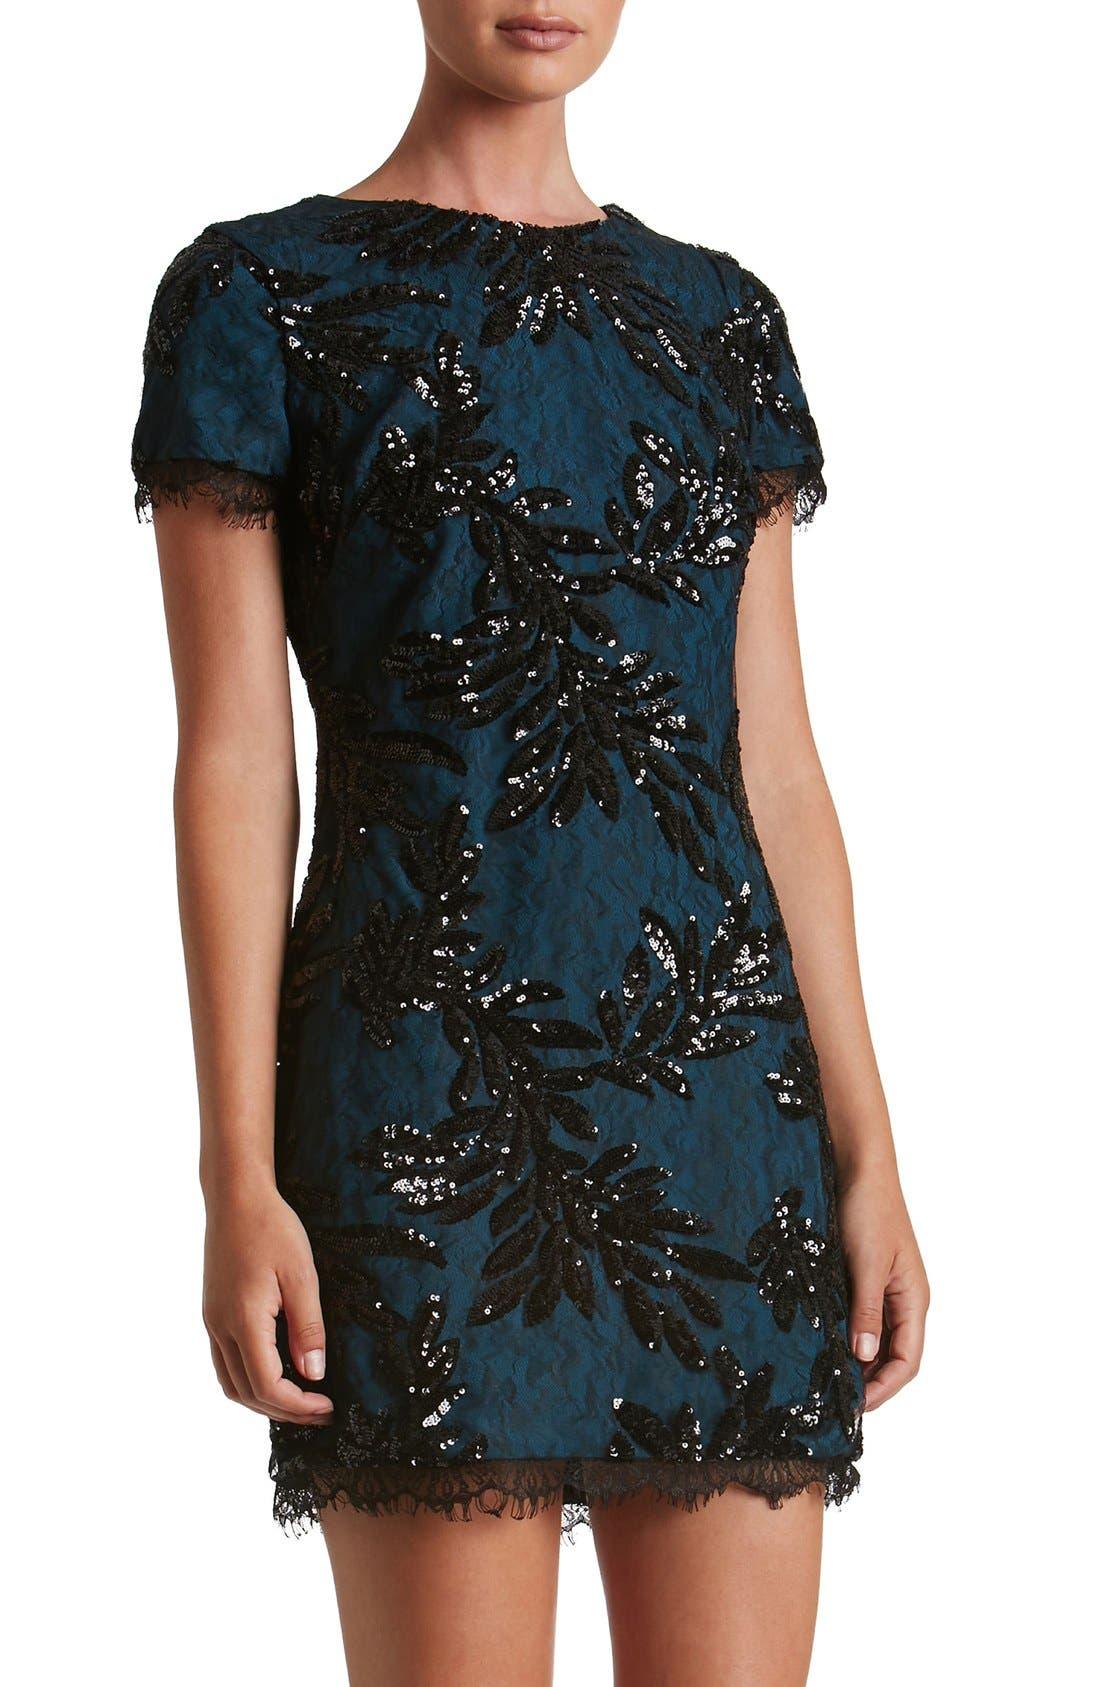 Alternate Image 1 Selected - Dress the Population Valerie Sequin Lace Sheath Dress